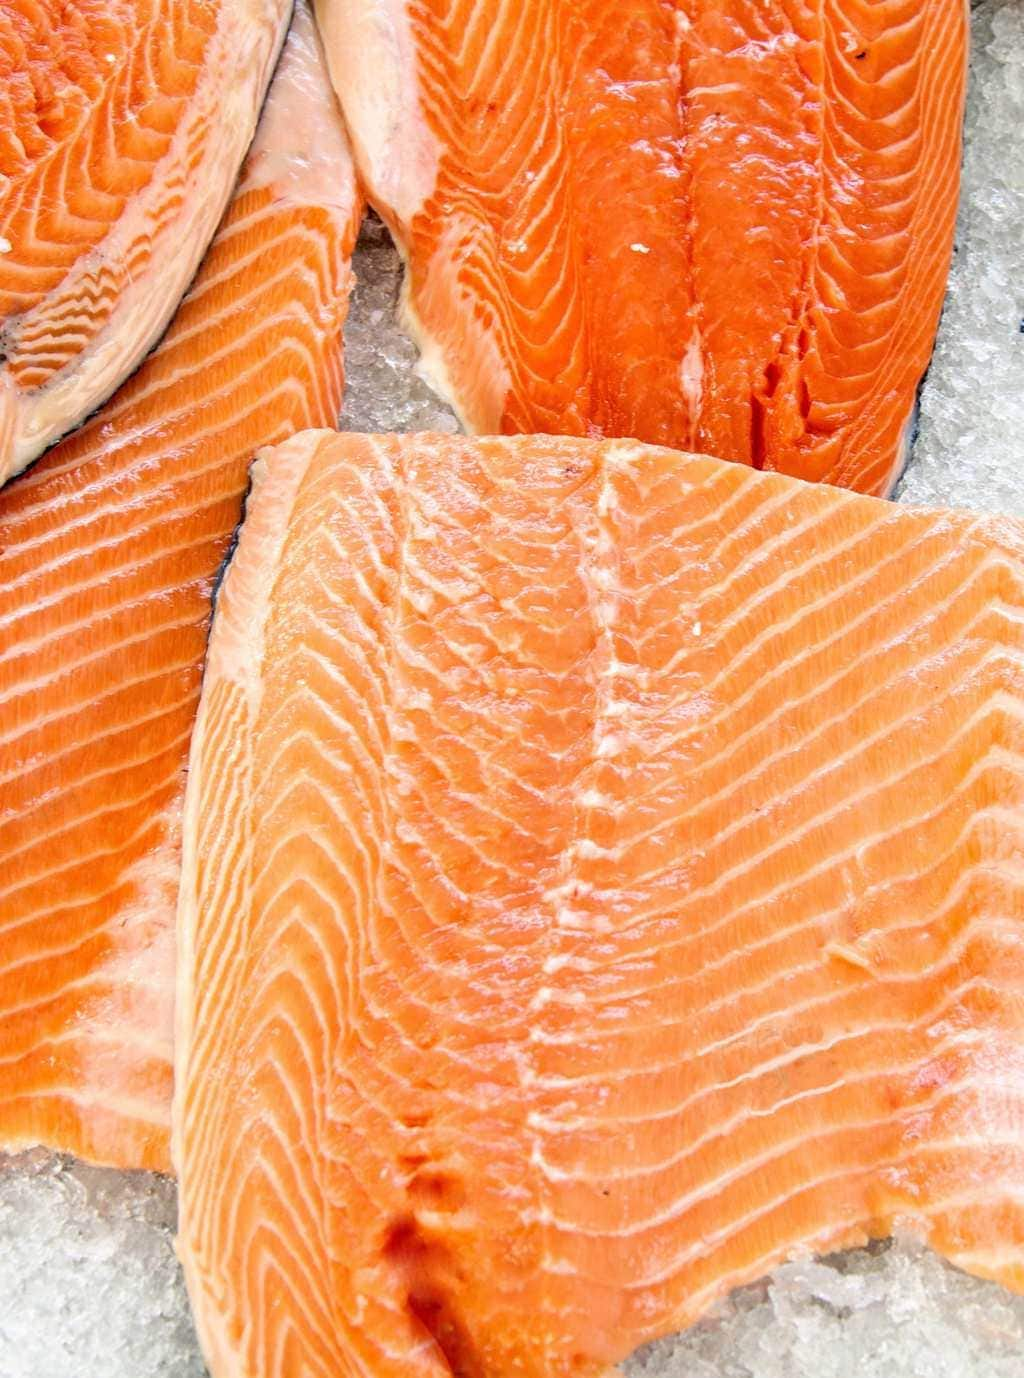 Uncooked salmon close crop